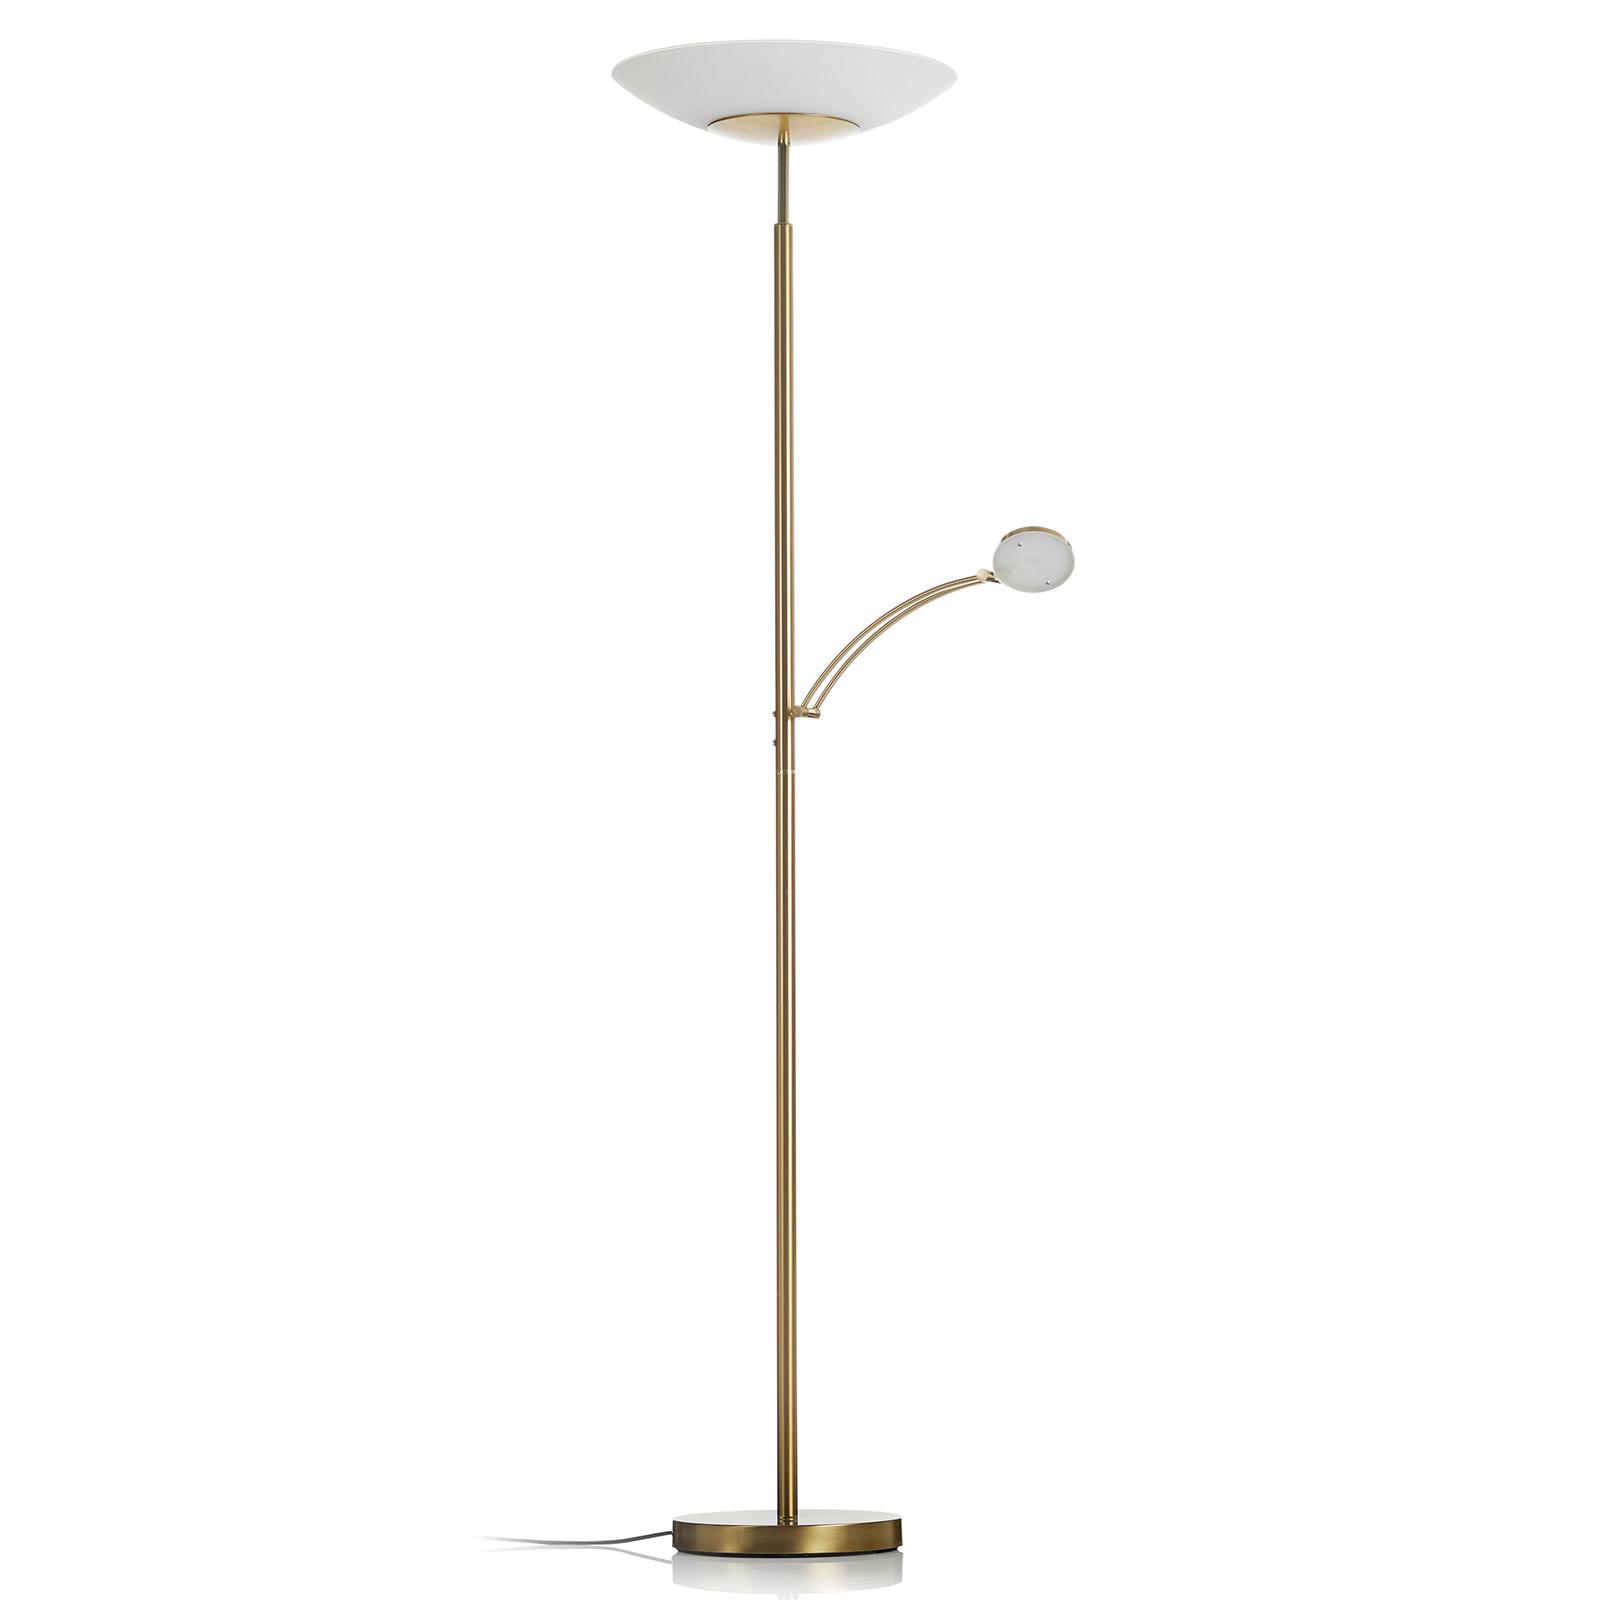 Paul Neuhaus Alfred LED-uplight messing